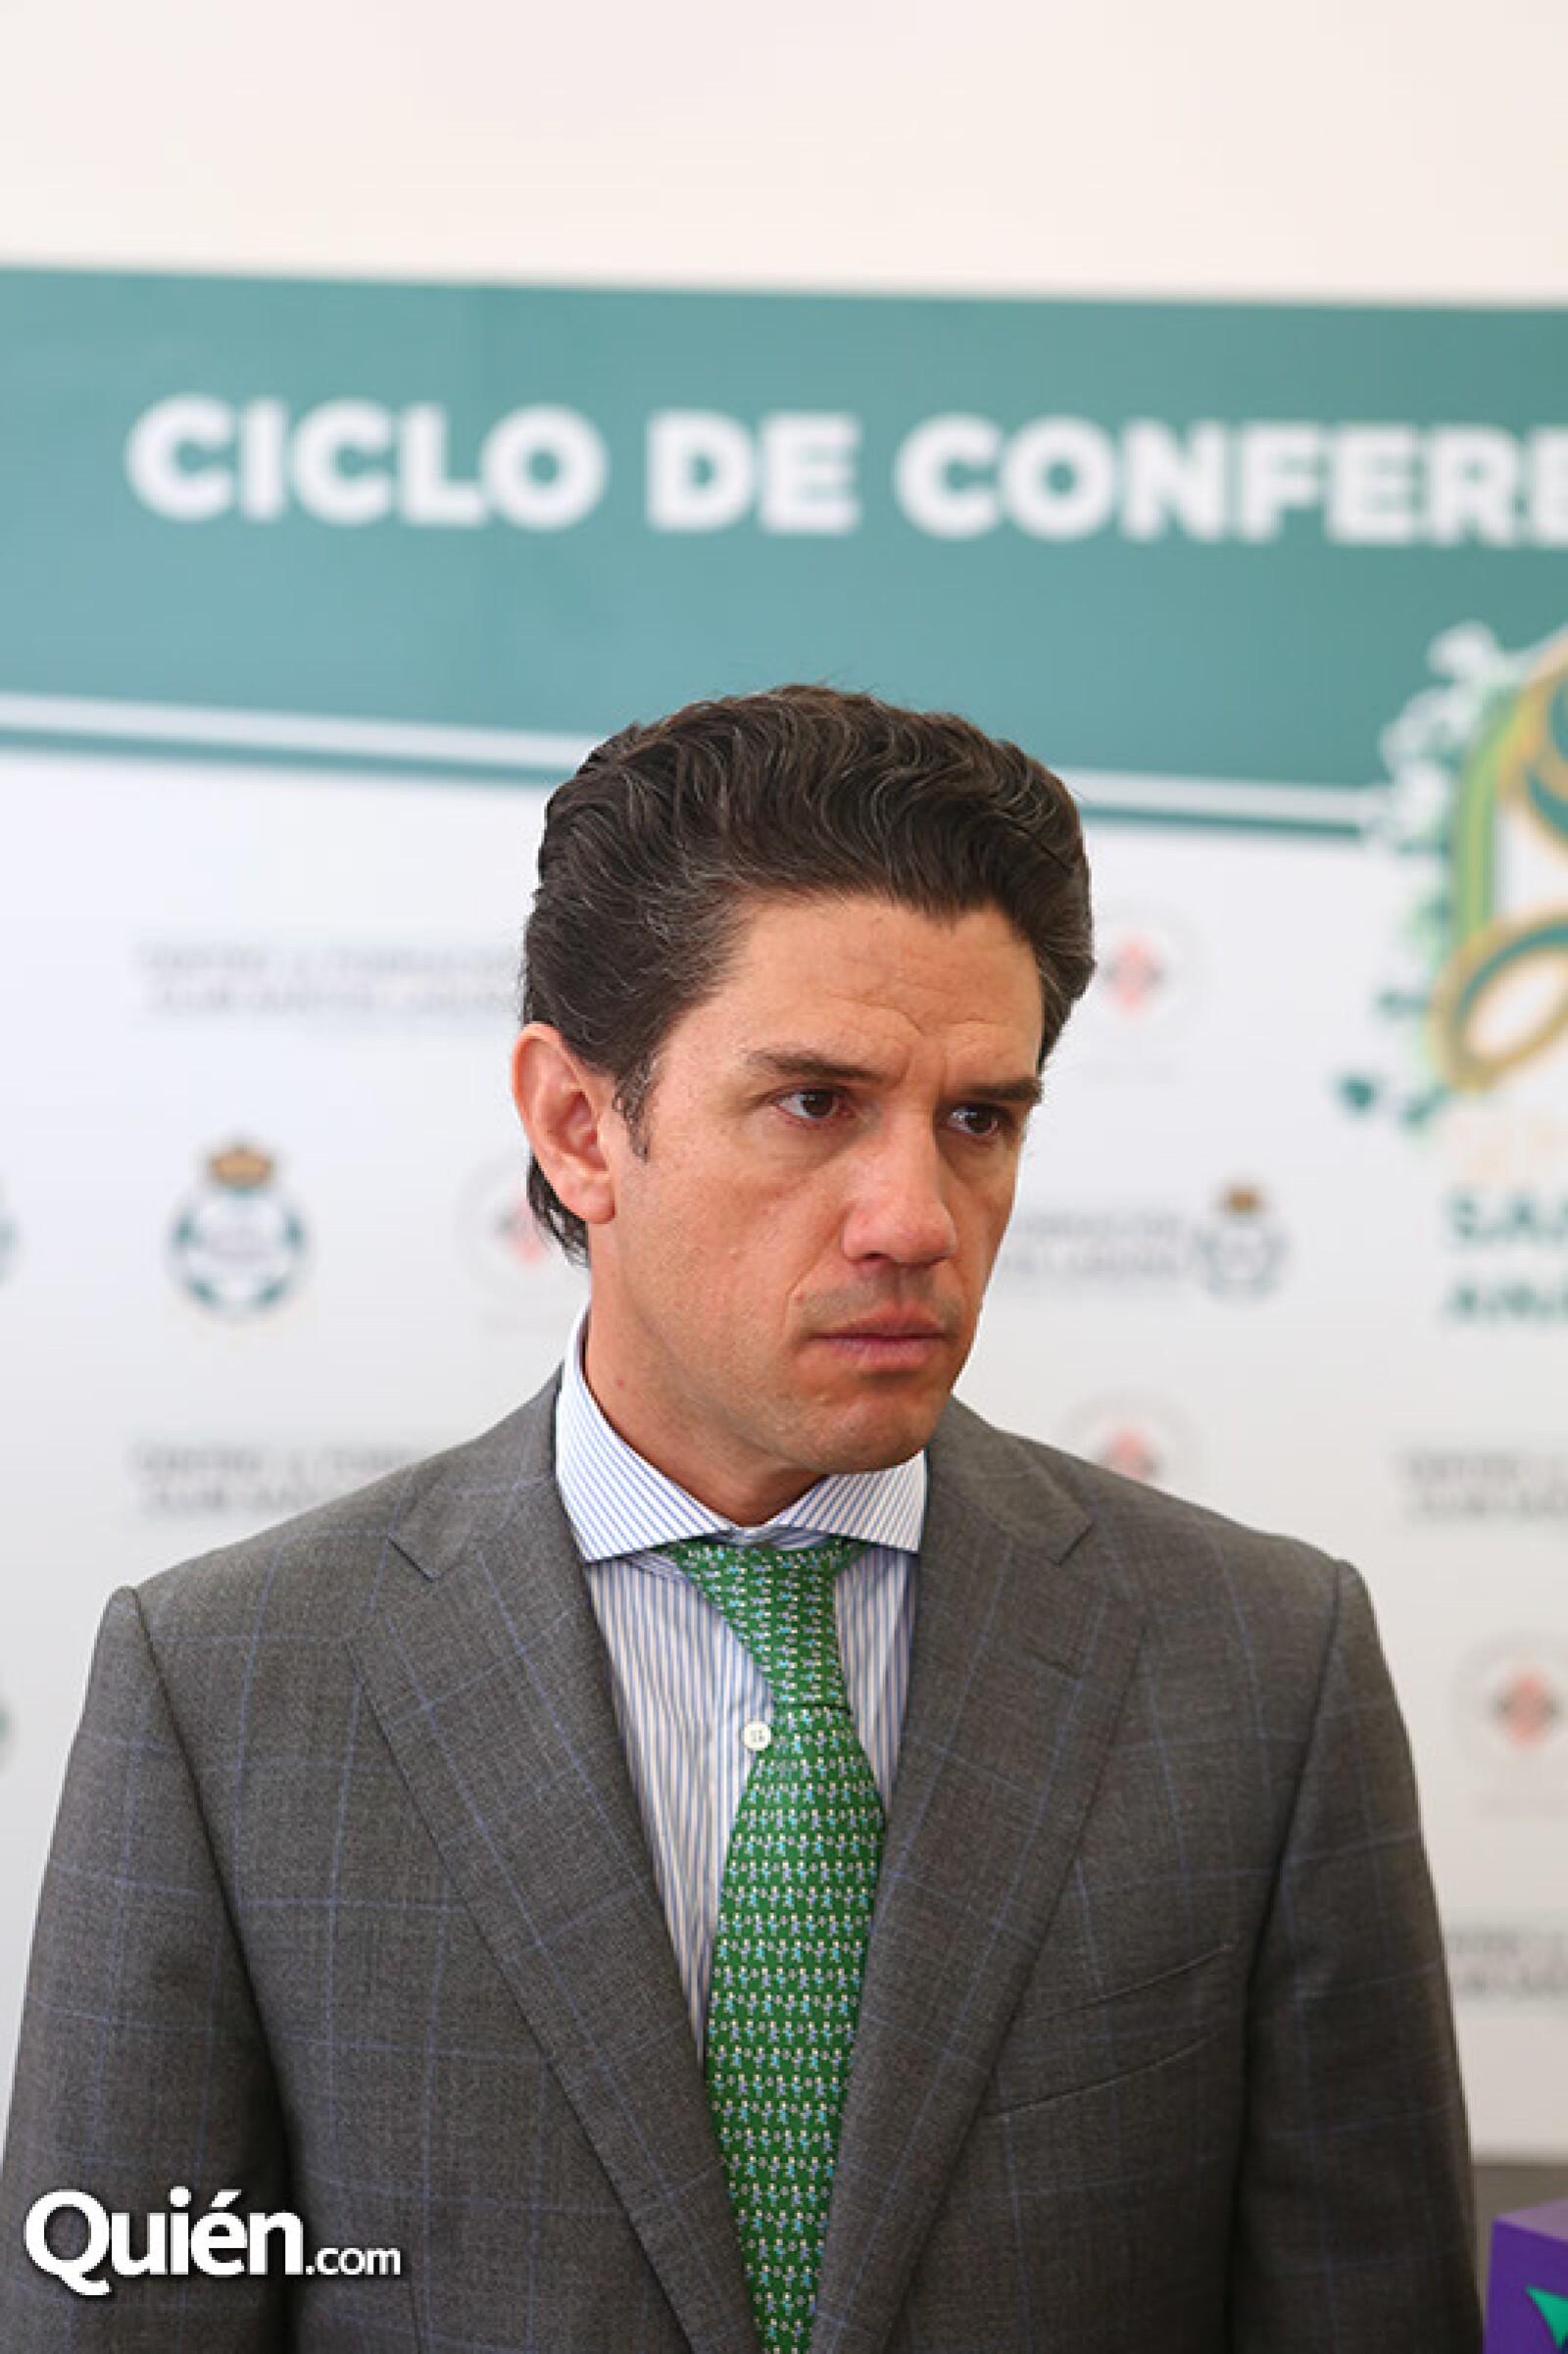 Alejandro Irarragorri